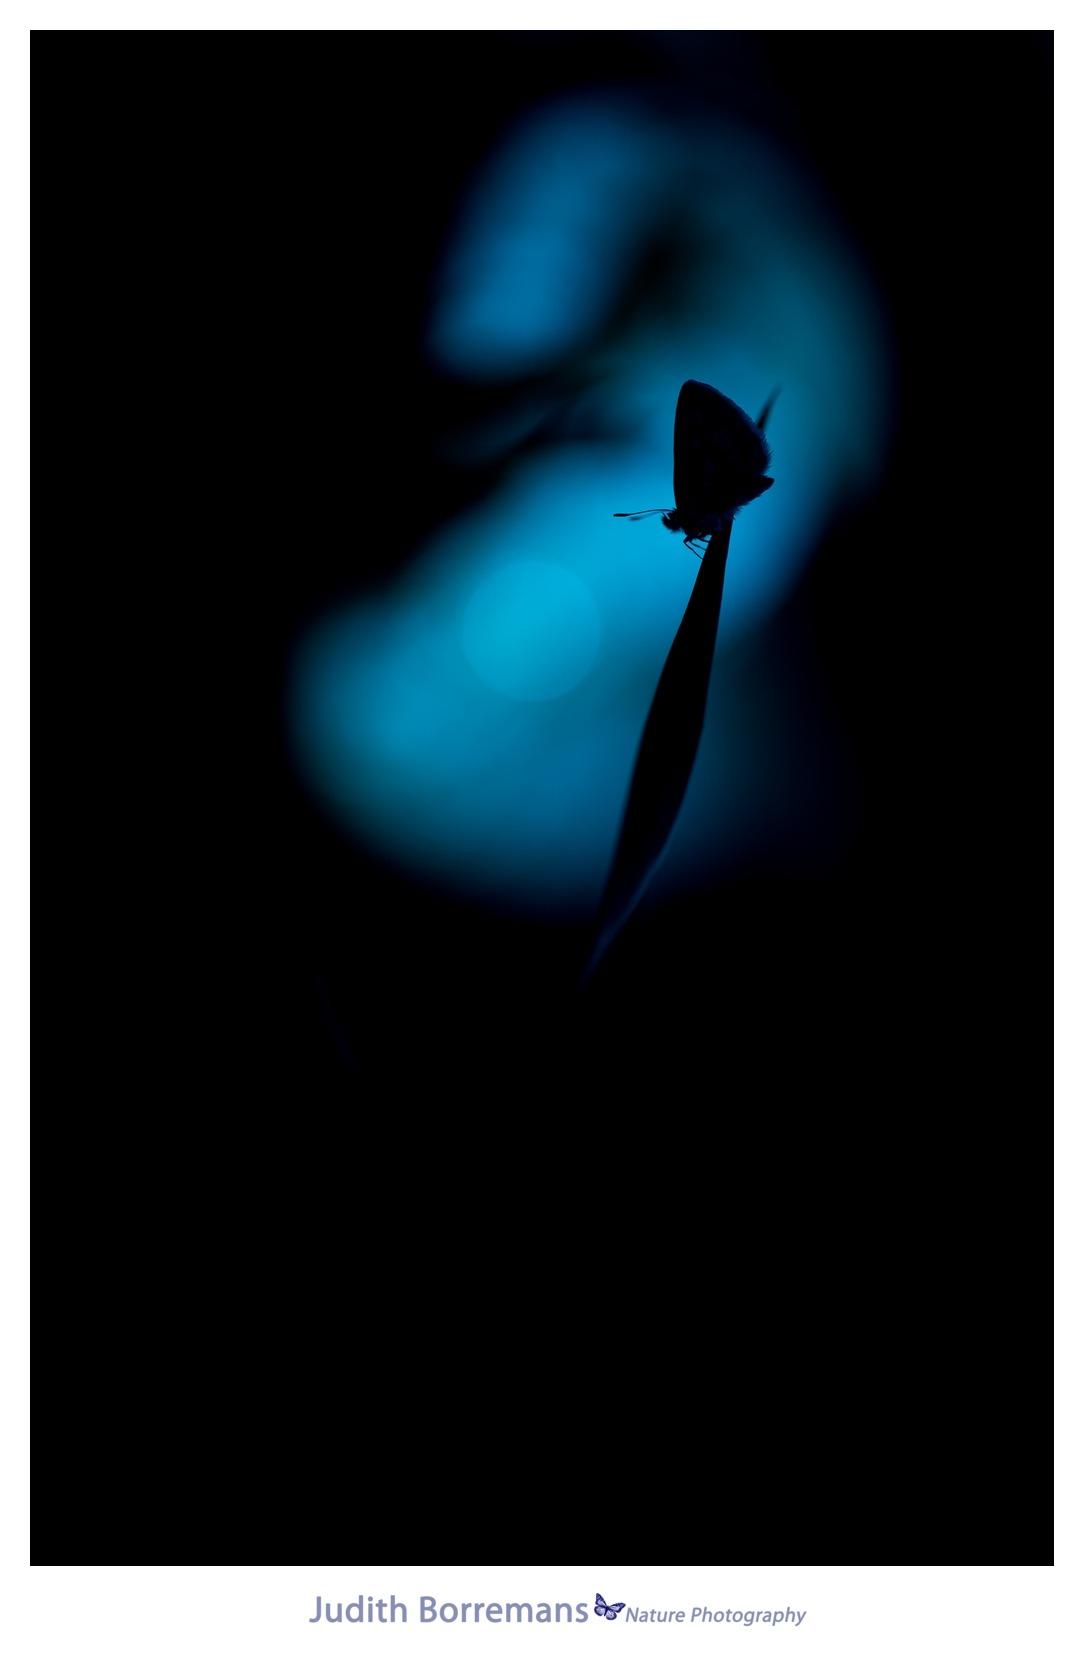 Icarusblauwtje in silhouette